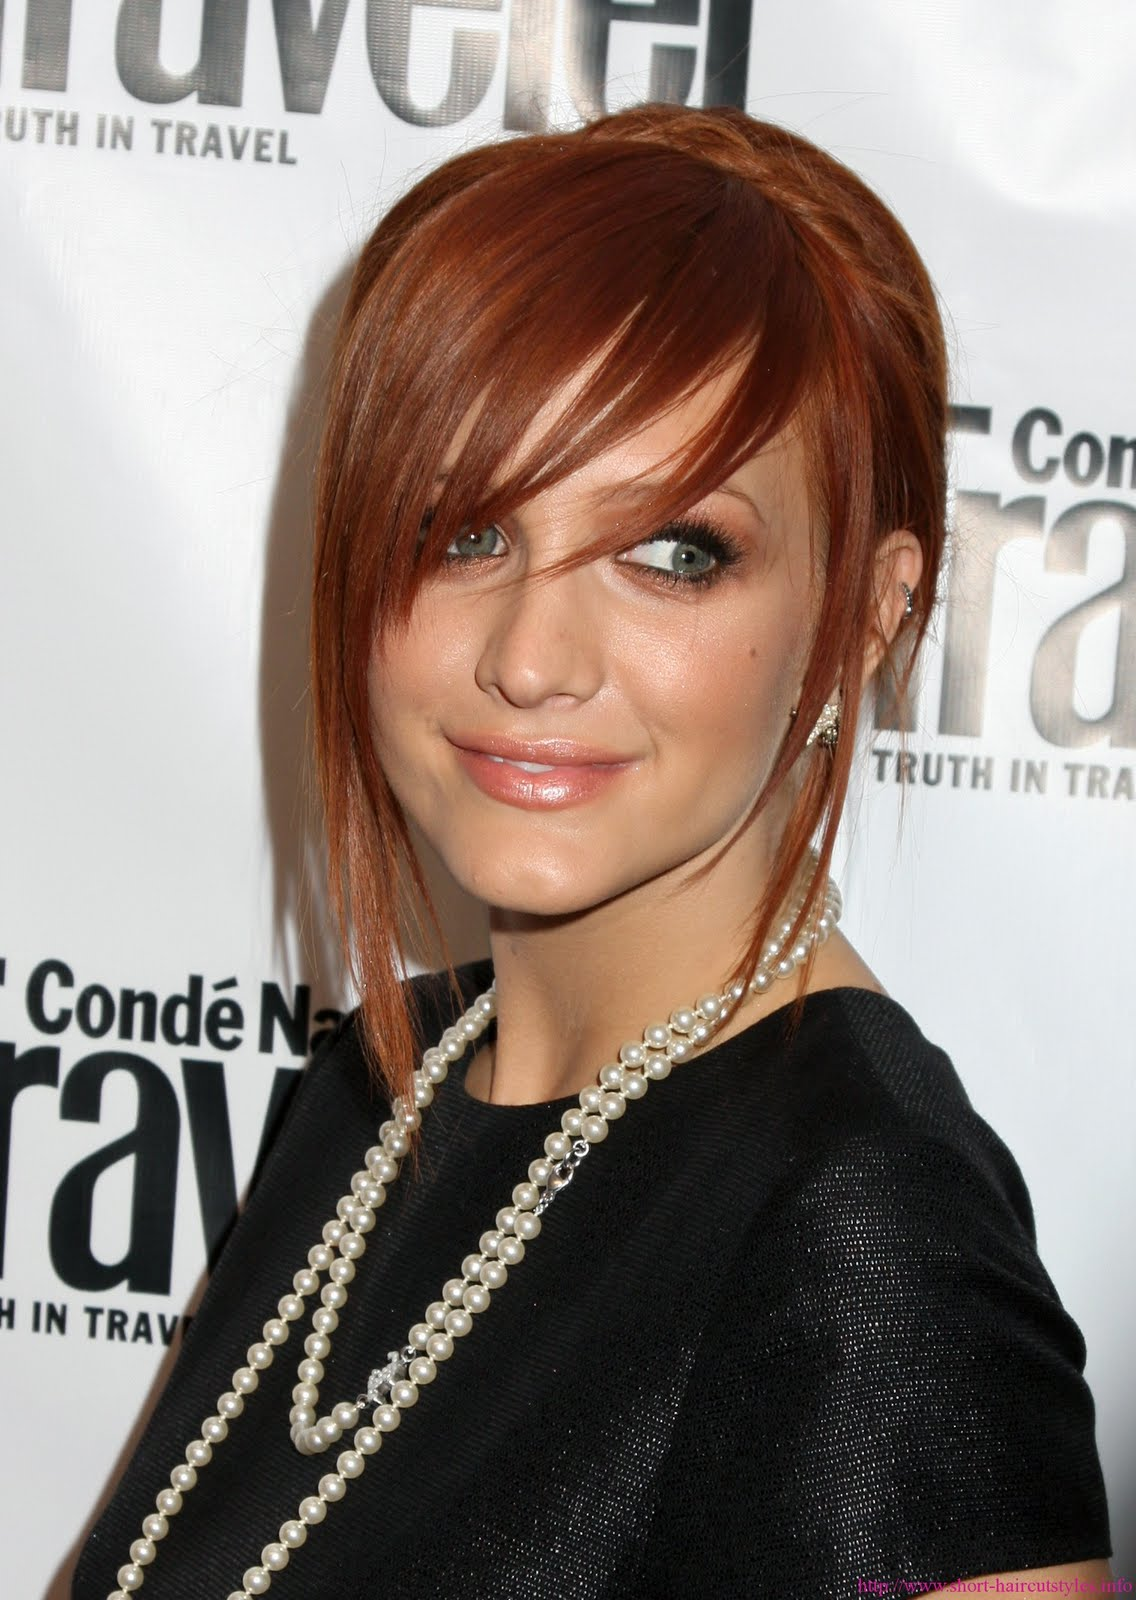 http://4.bp.blogspot.com/-A-AwTpN7FyI/TbrcWuB6l6I/AAAAAAAAARQ/OJZfZTs3IWo/s1600/Celebrity-Haircut.jpg